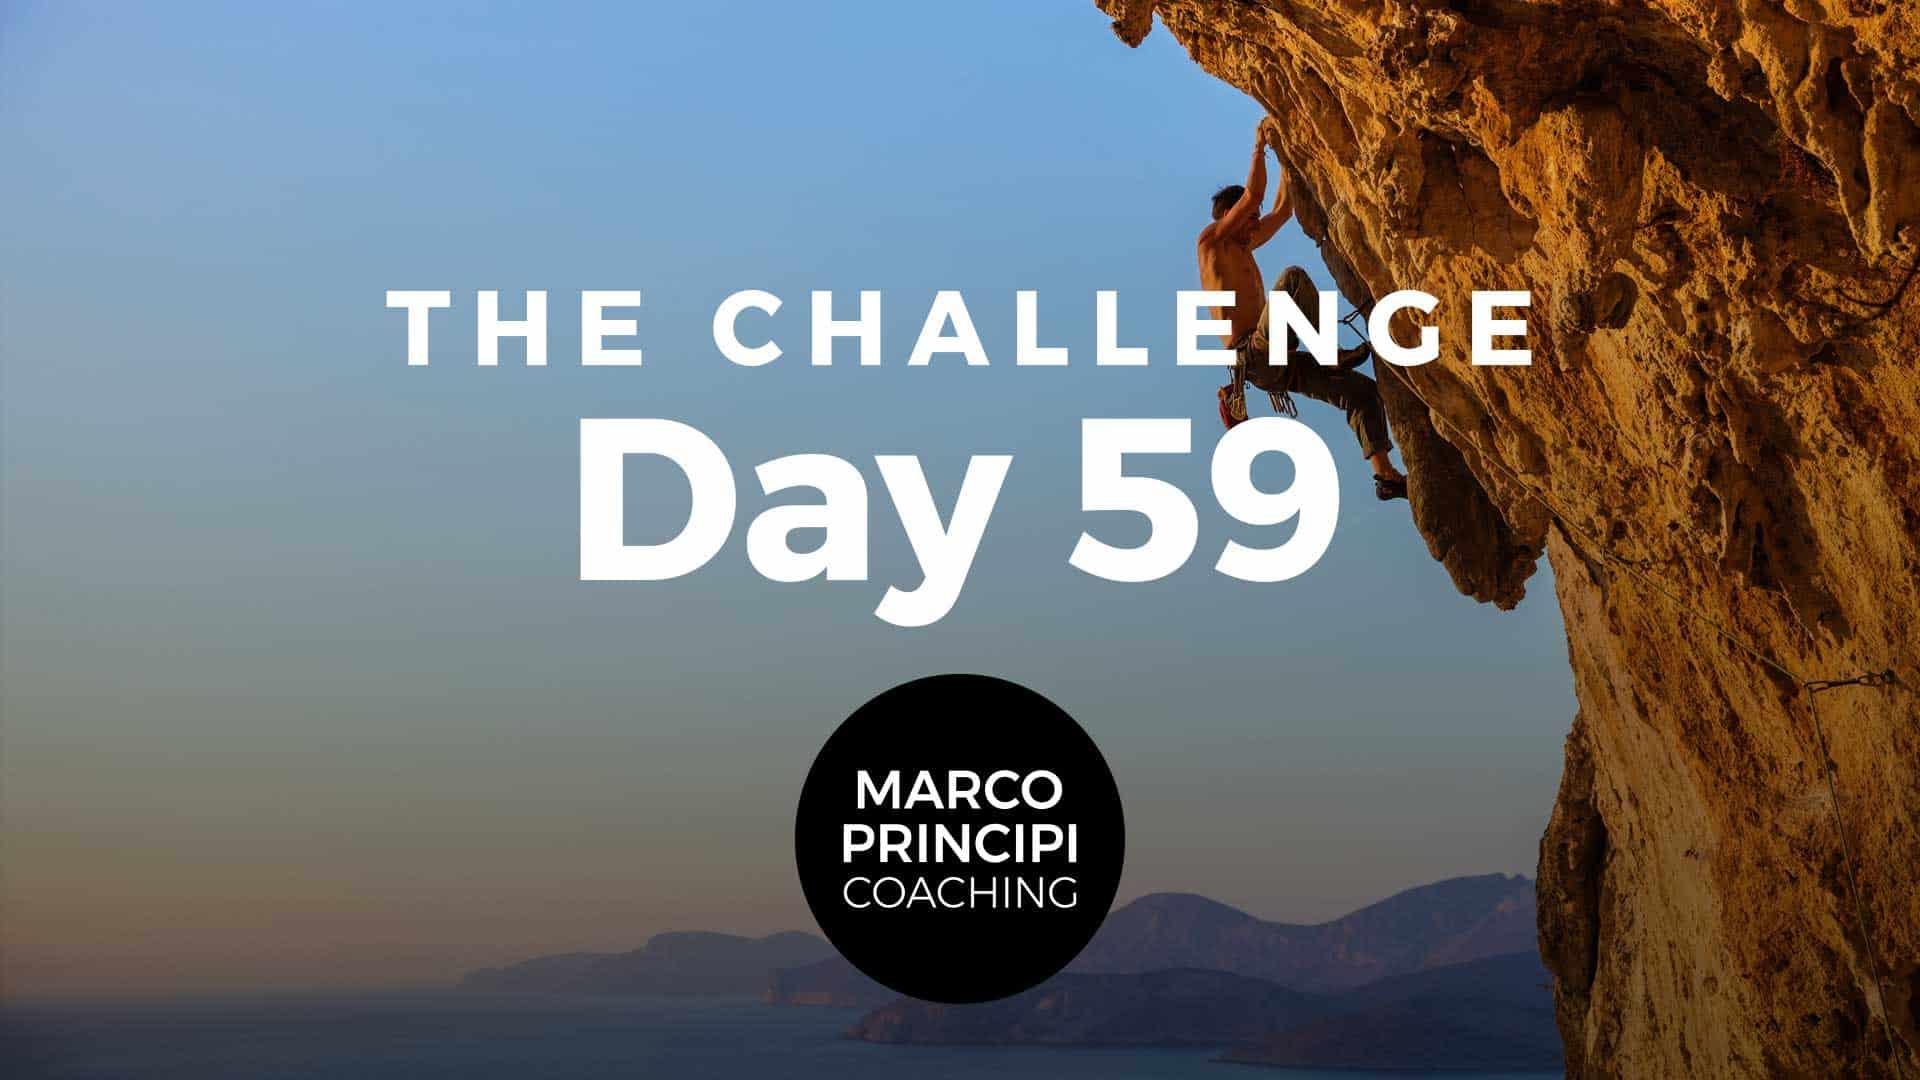 Marco Principi The Challenge Day 59